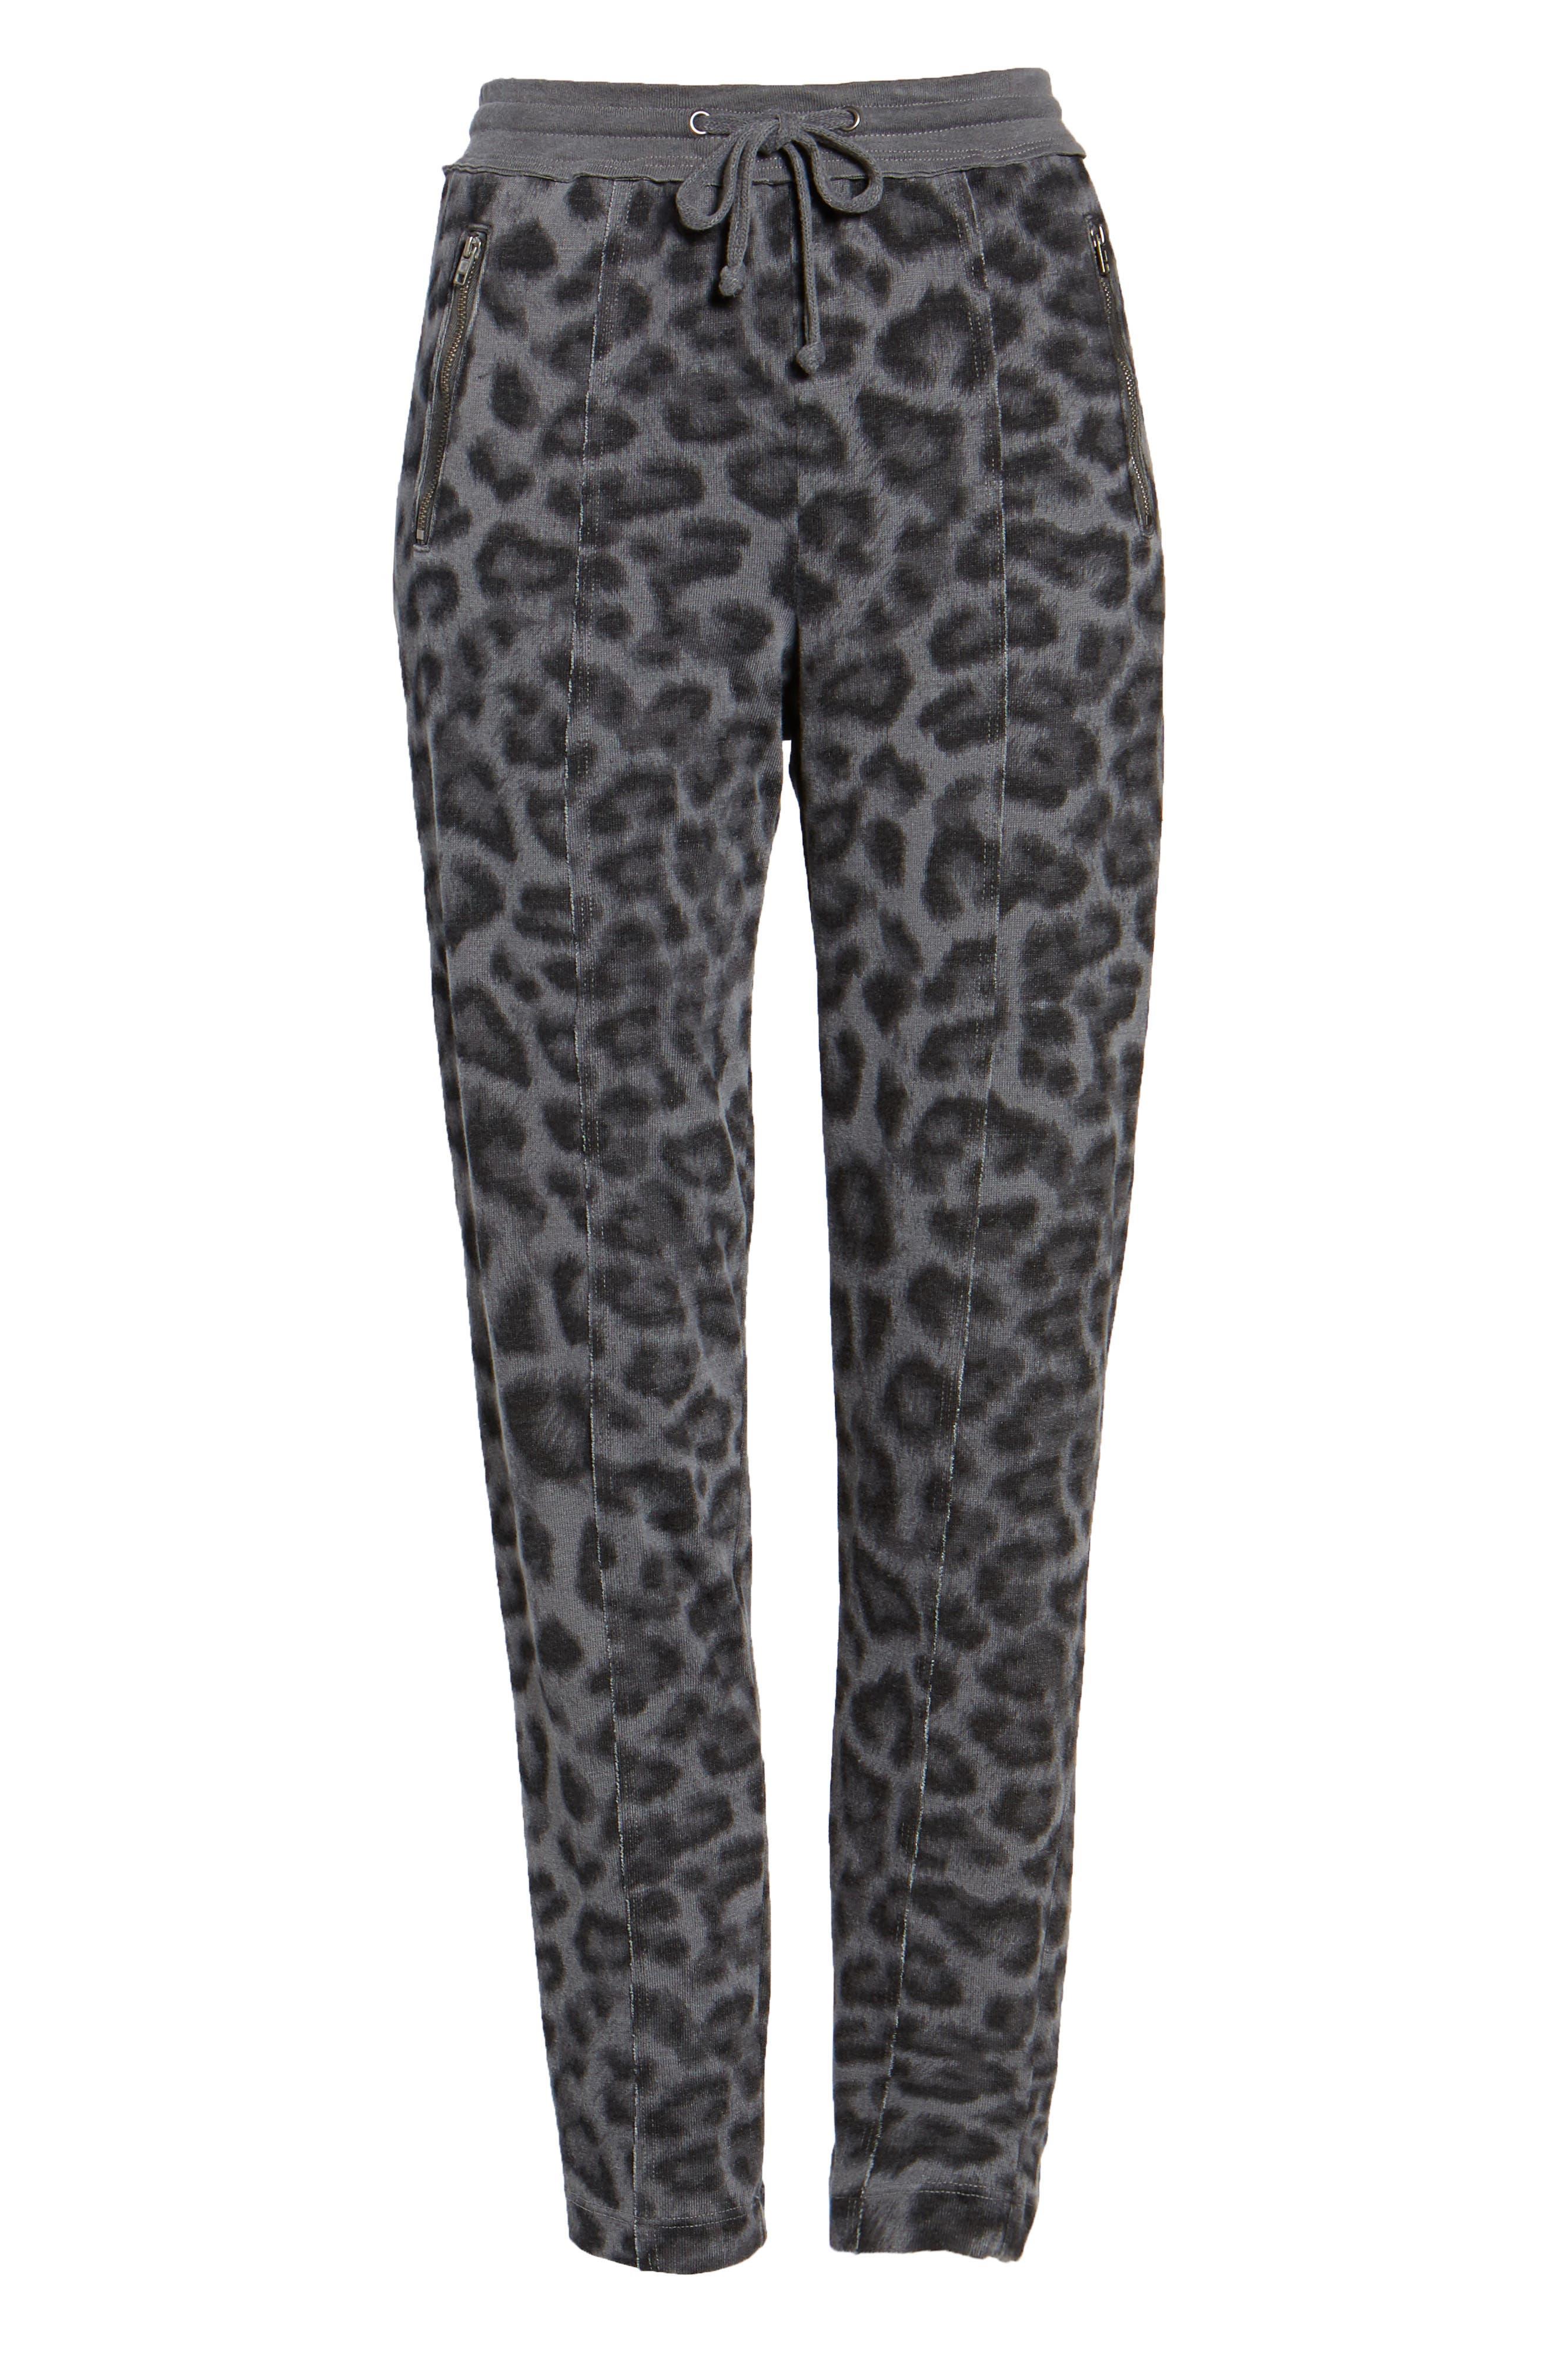 Leopard Print Jogger Pants,                             Alternate thumbnail 6, color,                             032